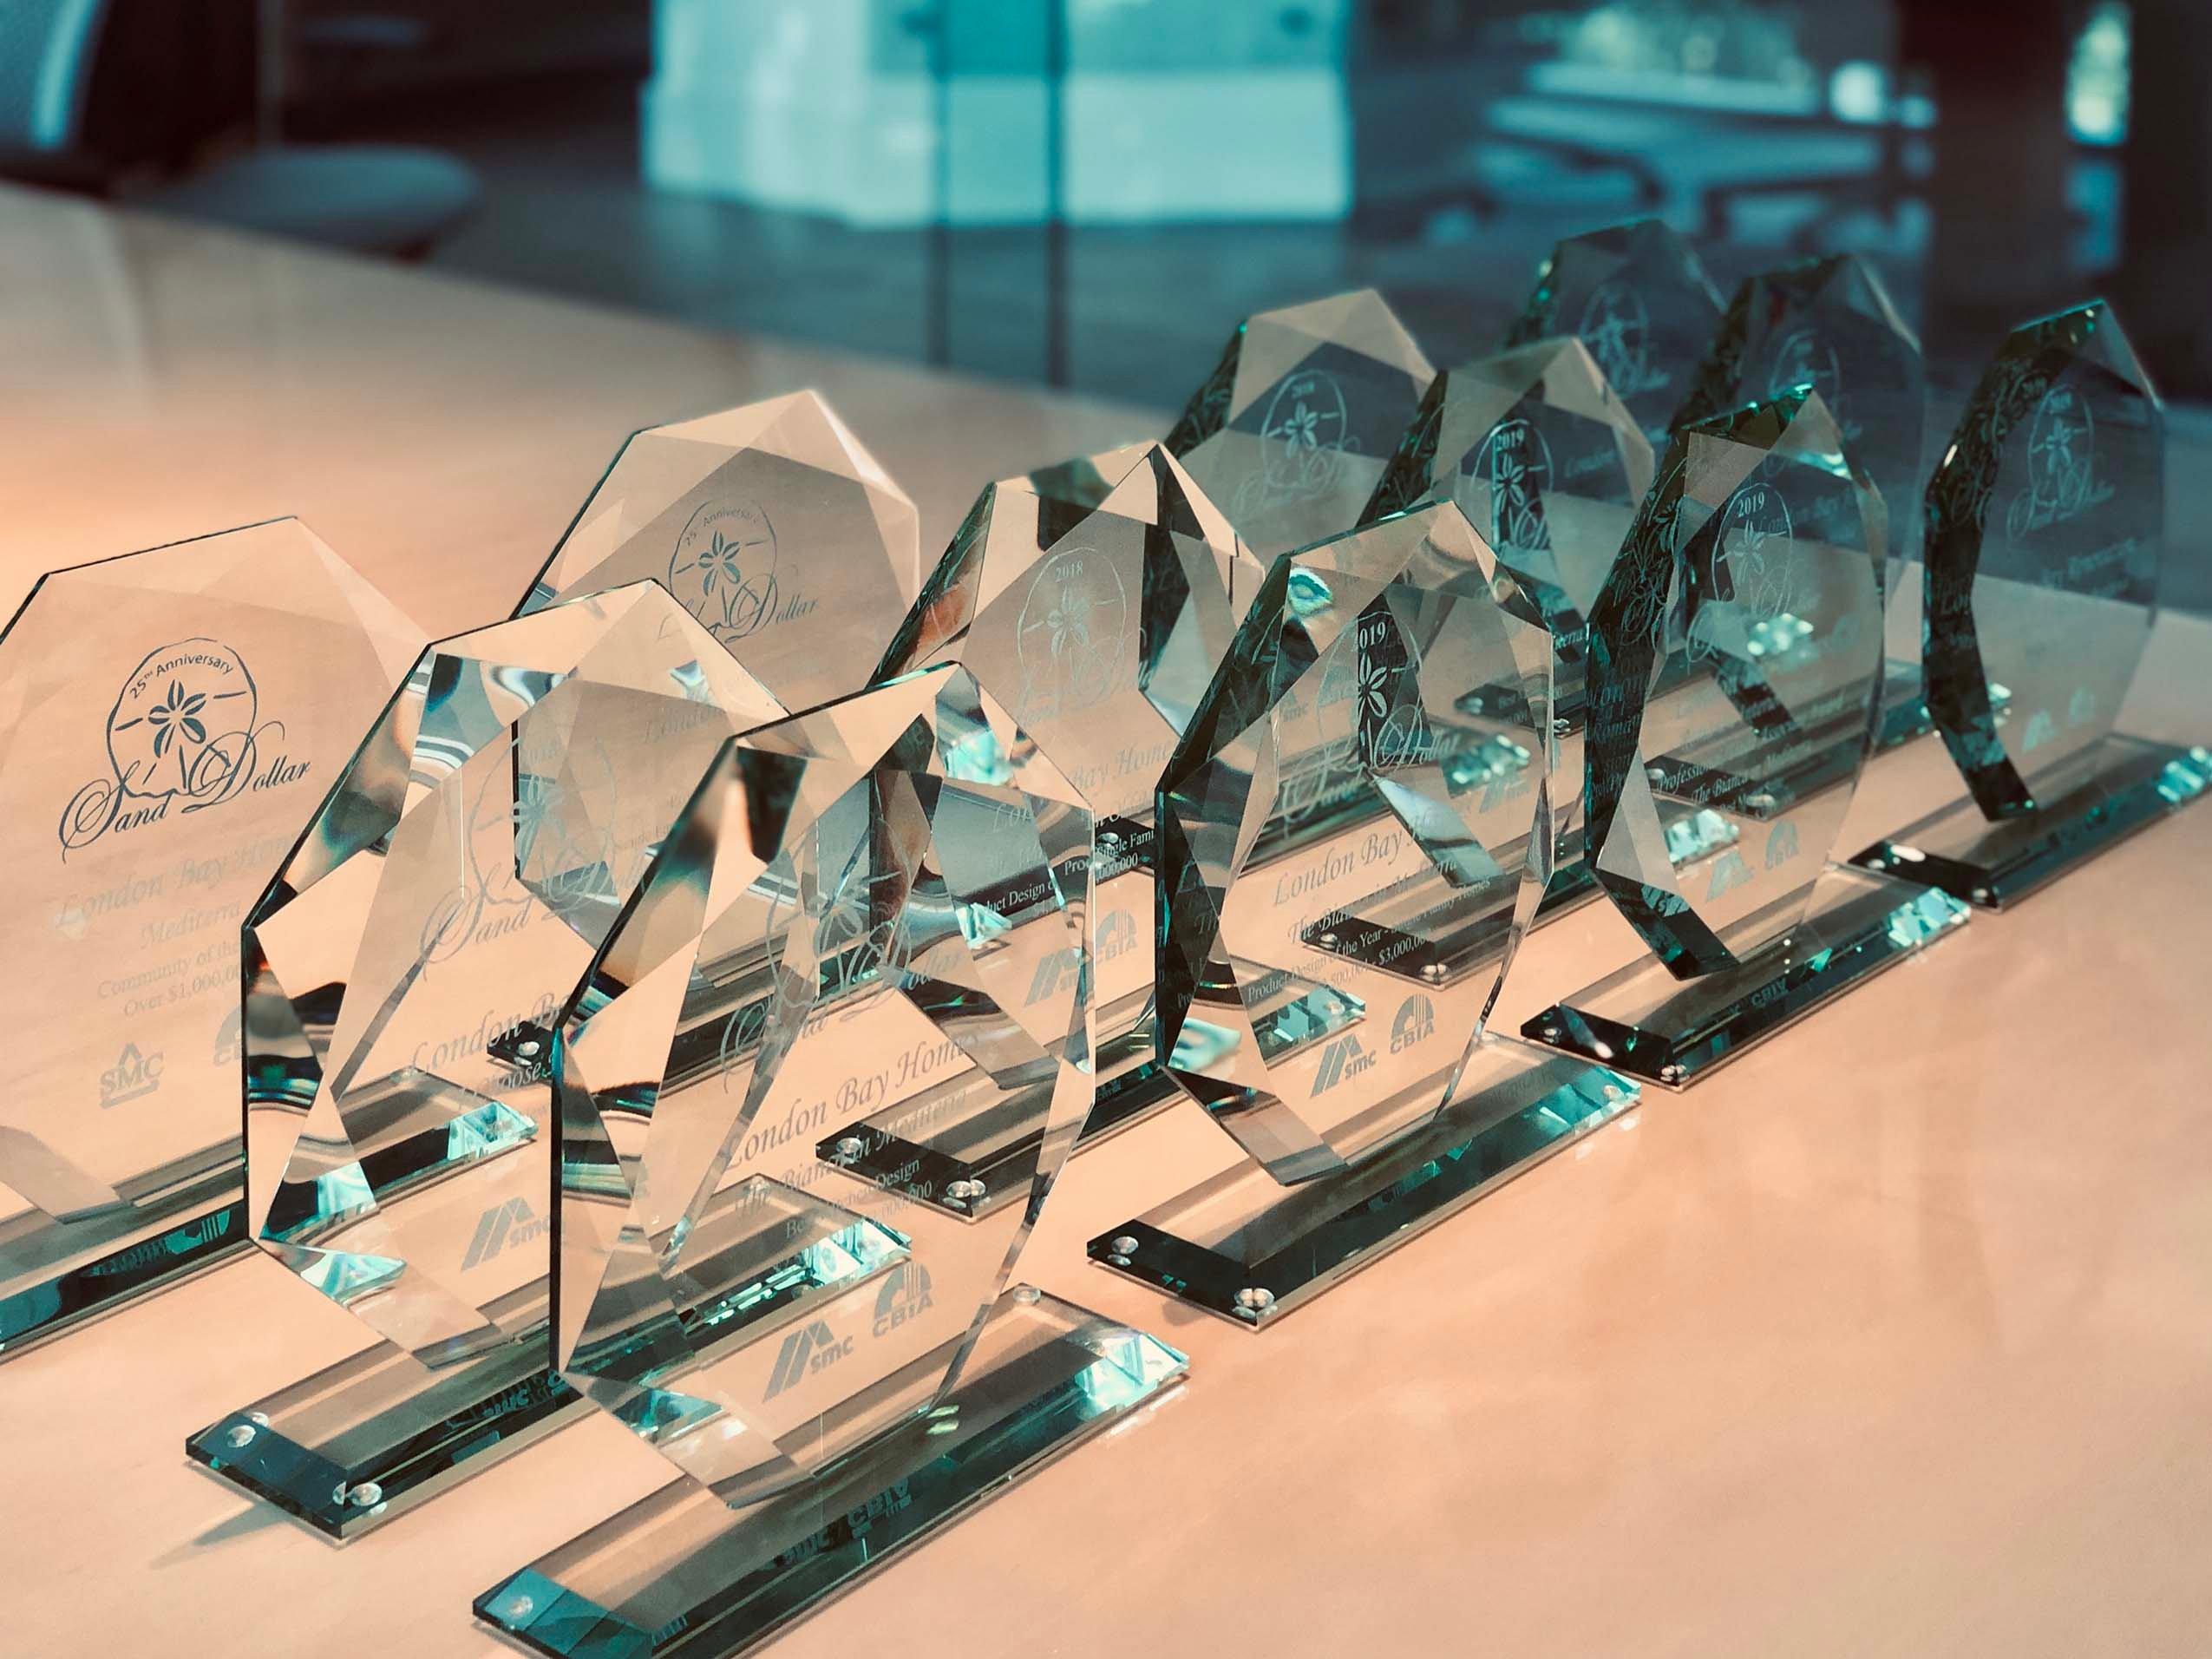 London Bay Homes honored with 12 awards at 2019 Sand Dollar Awards